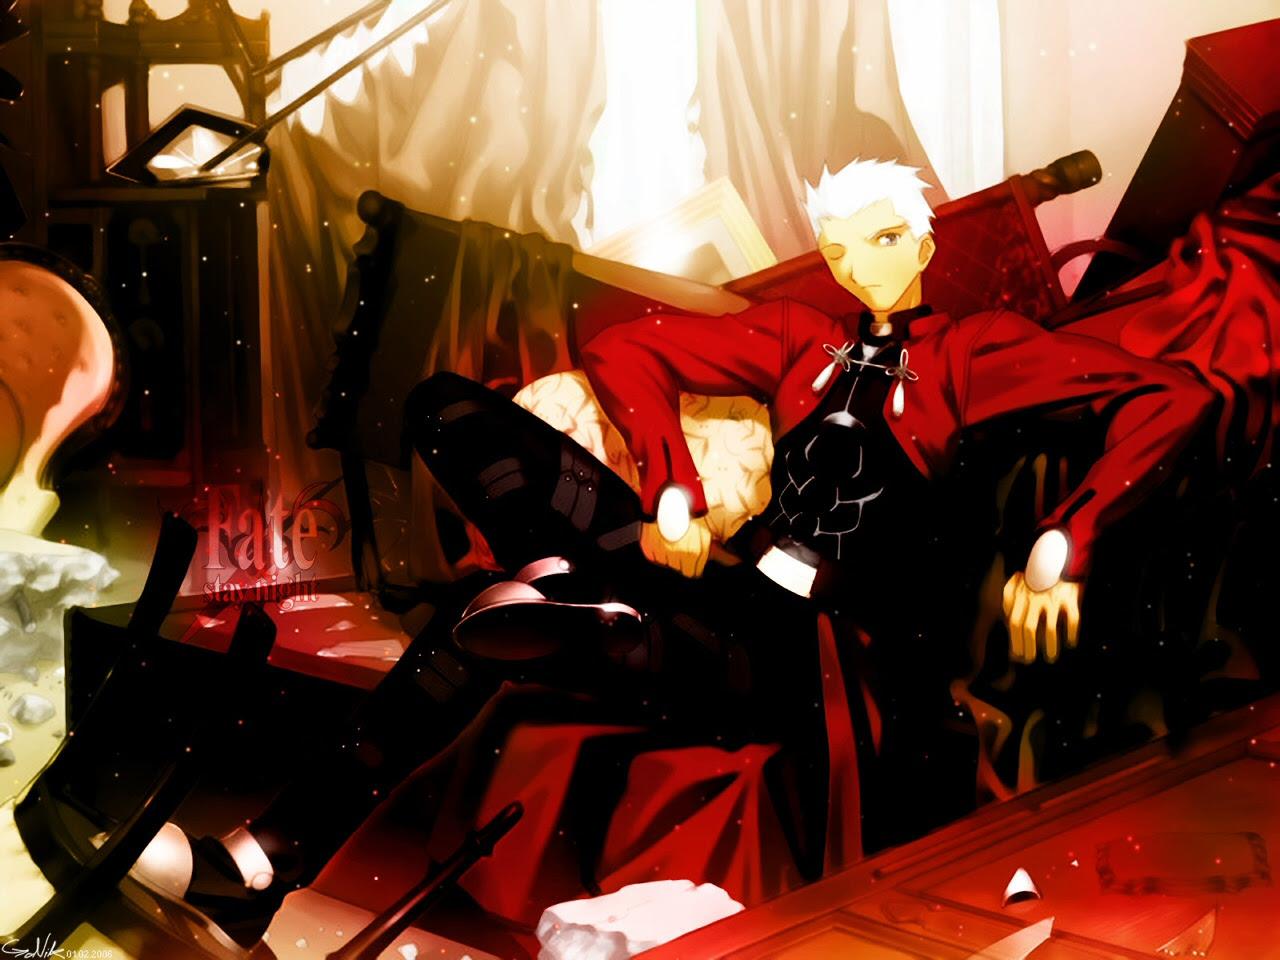 Fate Stay Night Wallpaper Archer 22 Hd Wallpaper Animewp Com